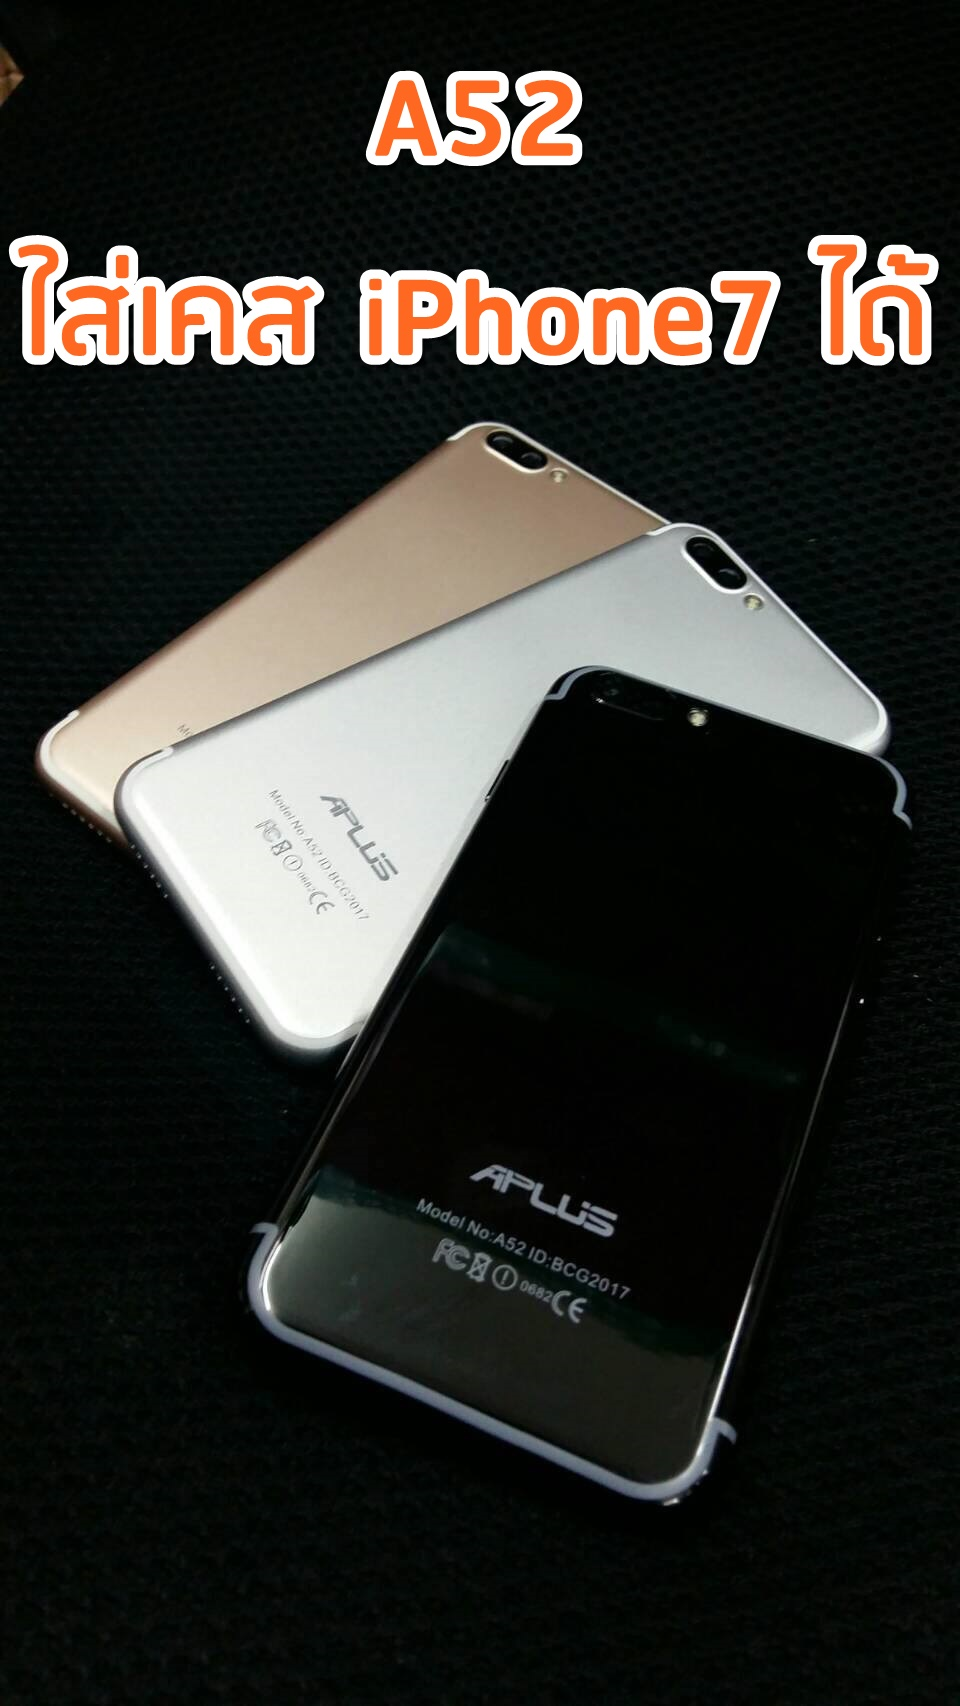 APLUS A52 หน้า i7 ใส่เคสแท้ได้ จอ 4.5 นิ้ว ระบบ 3G